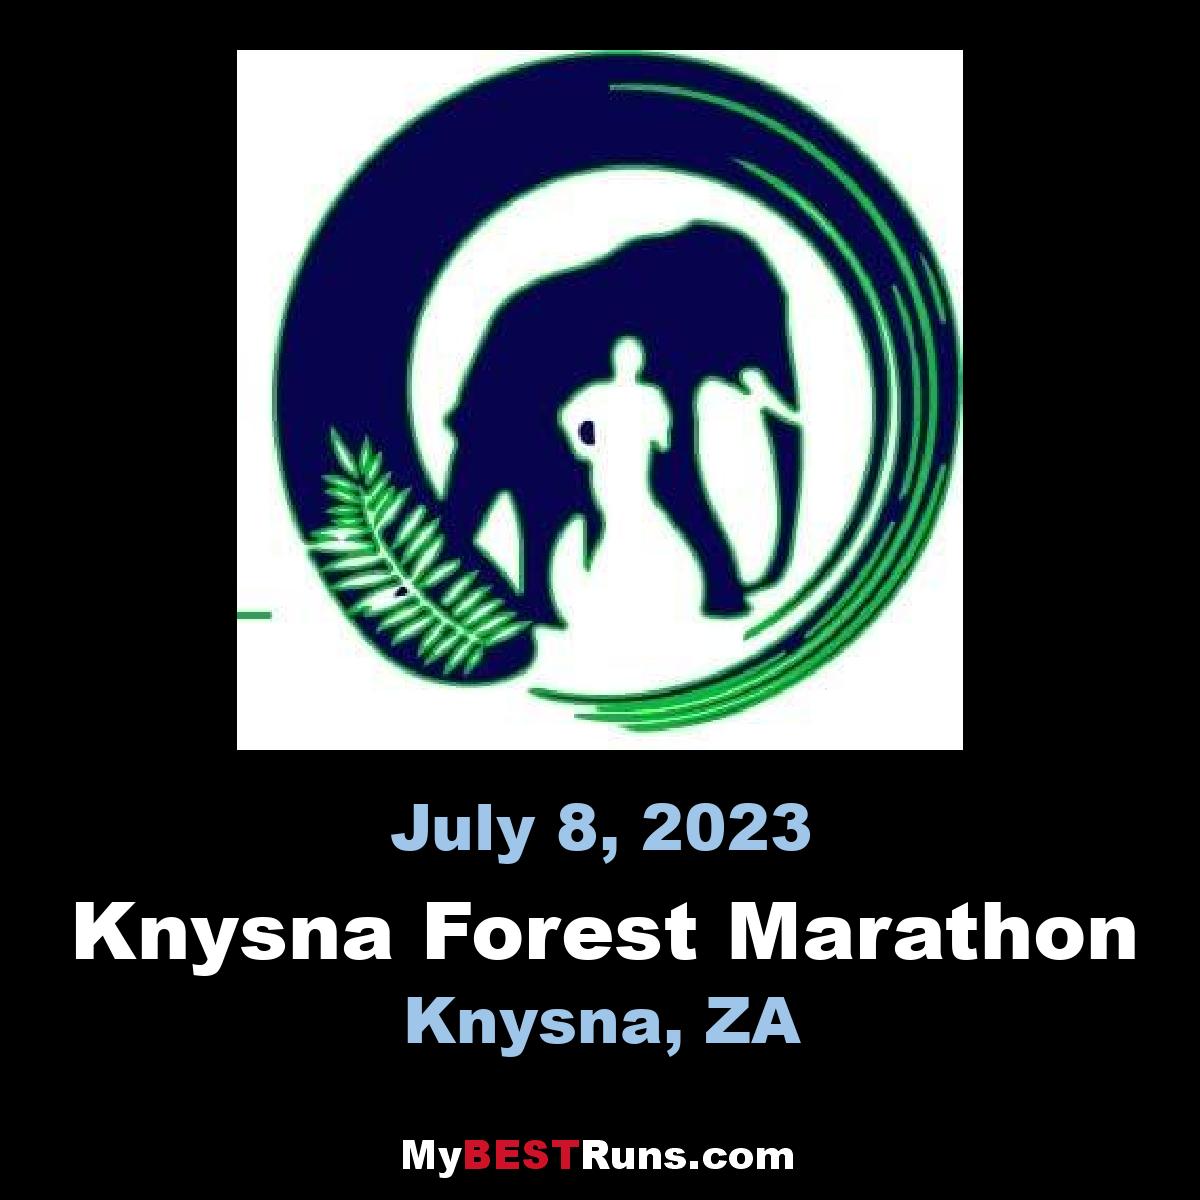 Knysna Forest Marathon